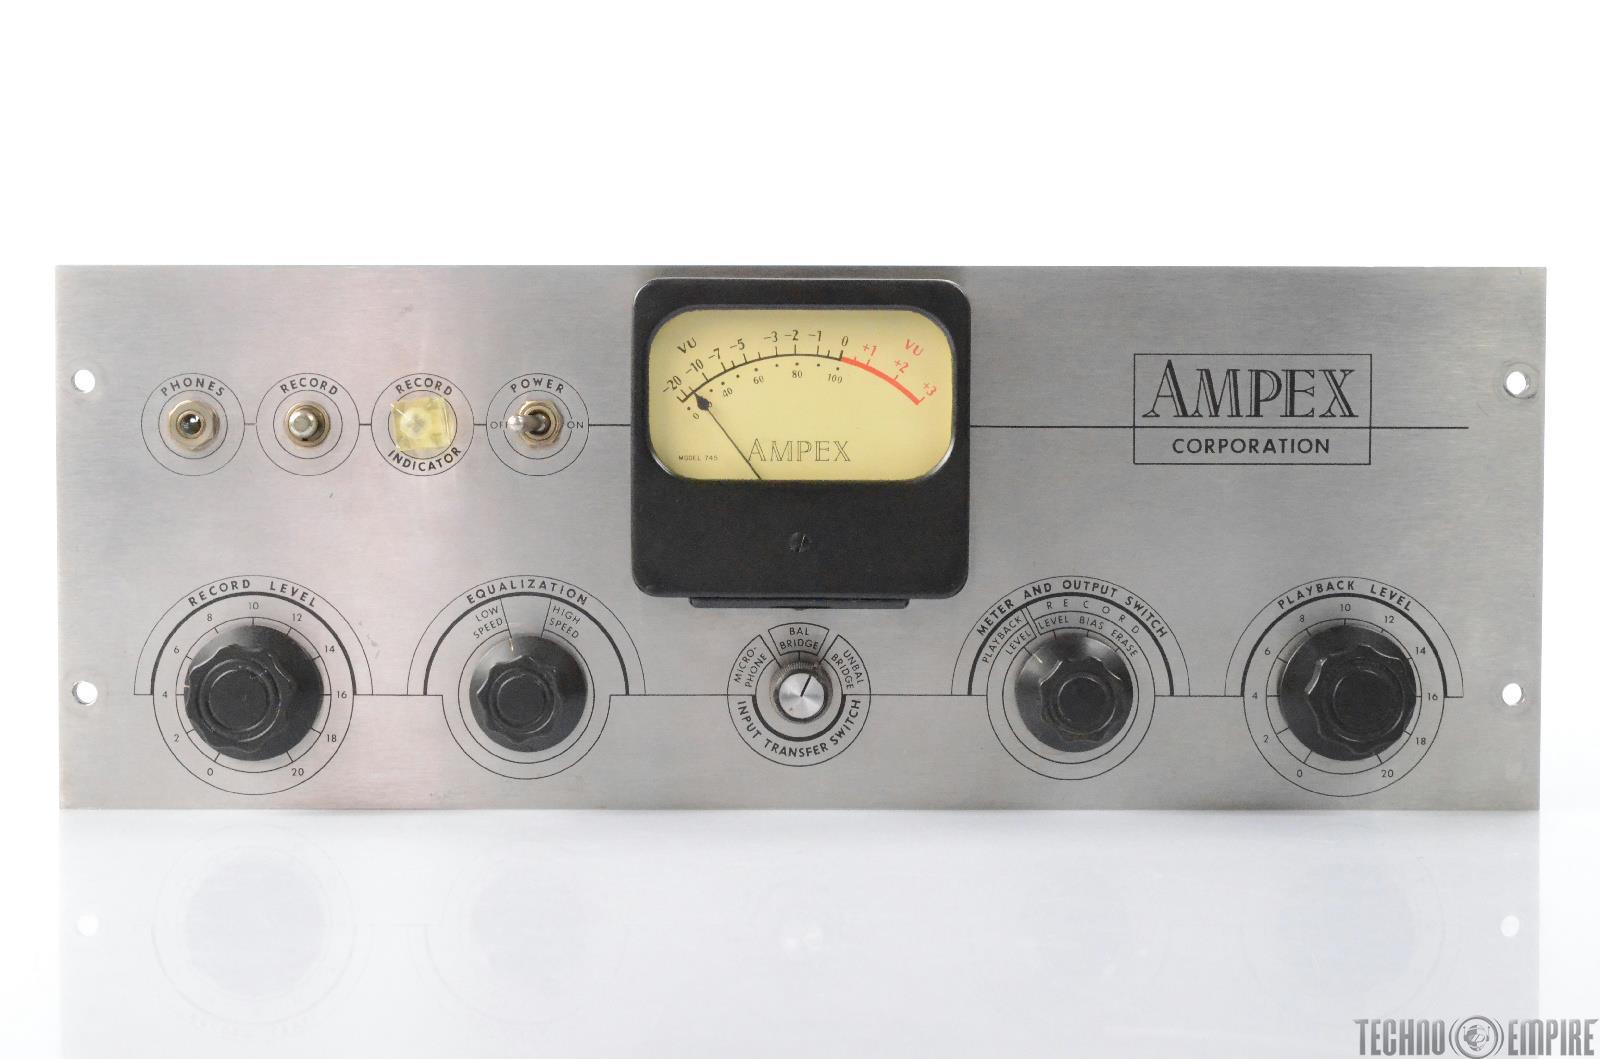 Ampex 350 R Mic Preamp Module w/ Tube Power Supply Fairfax Recordings #28641